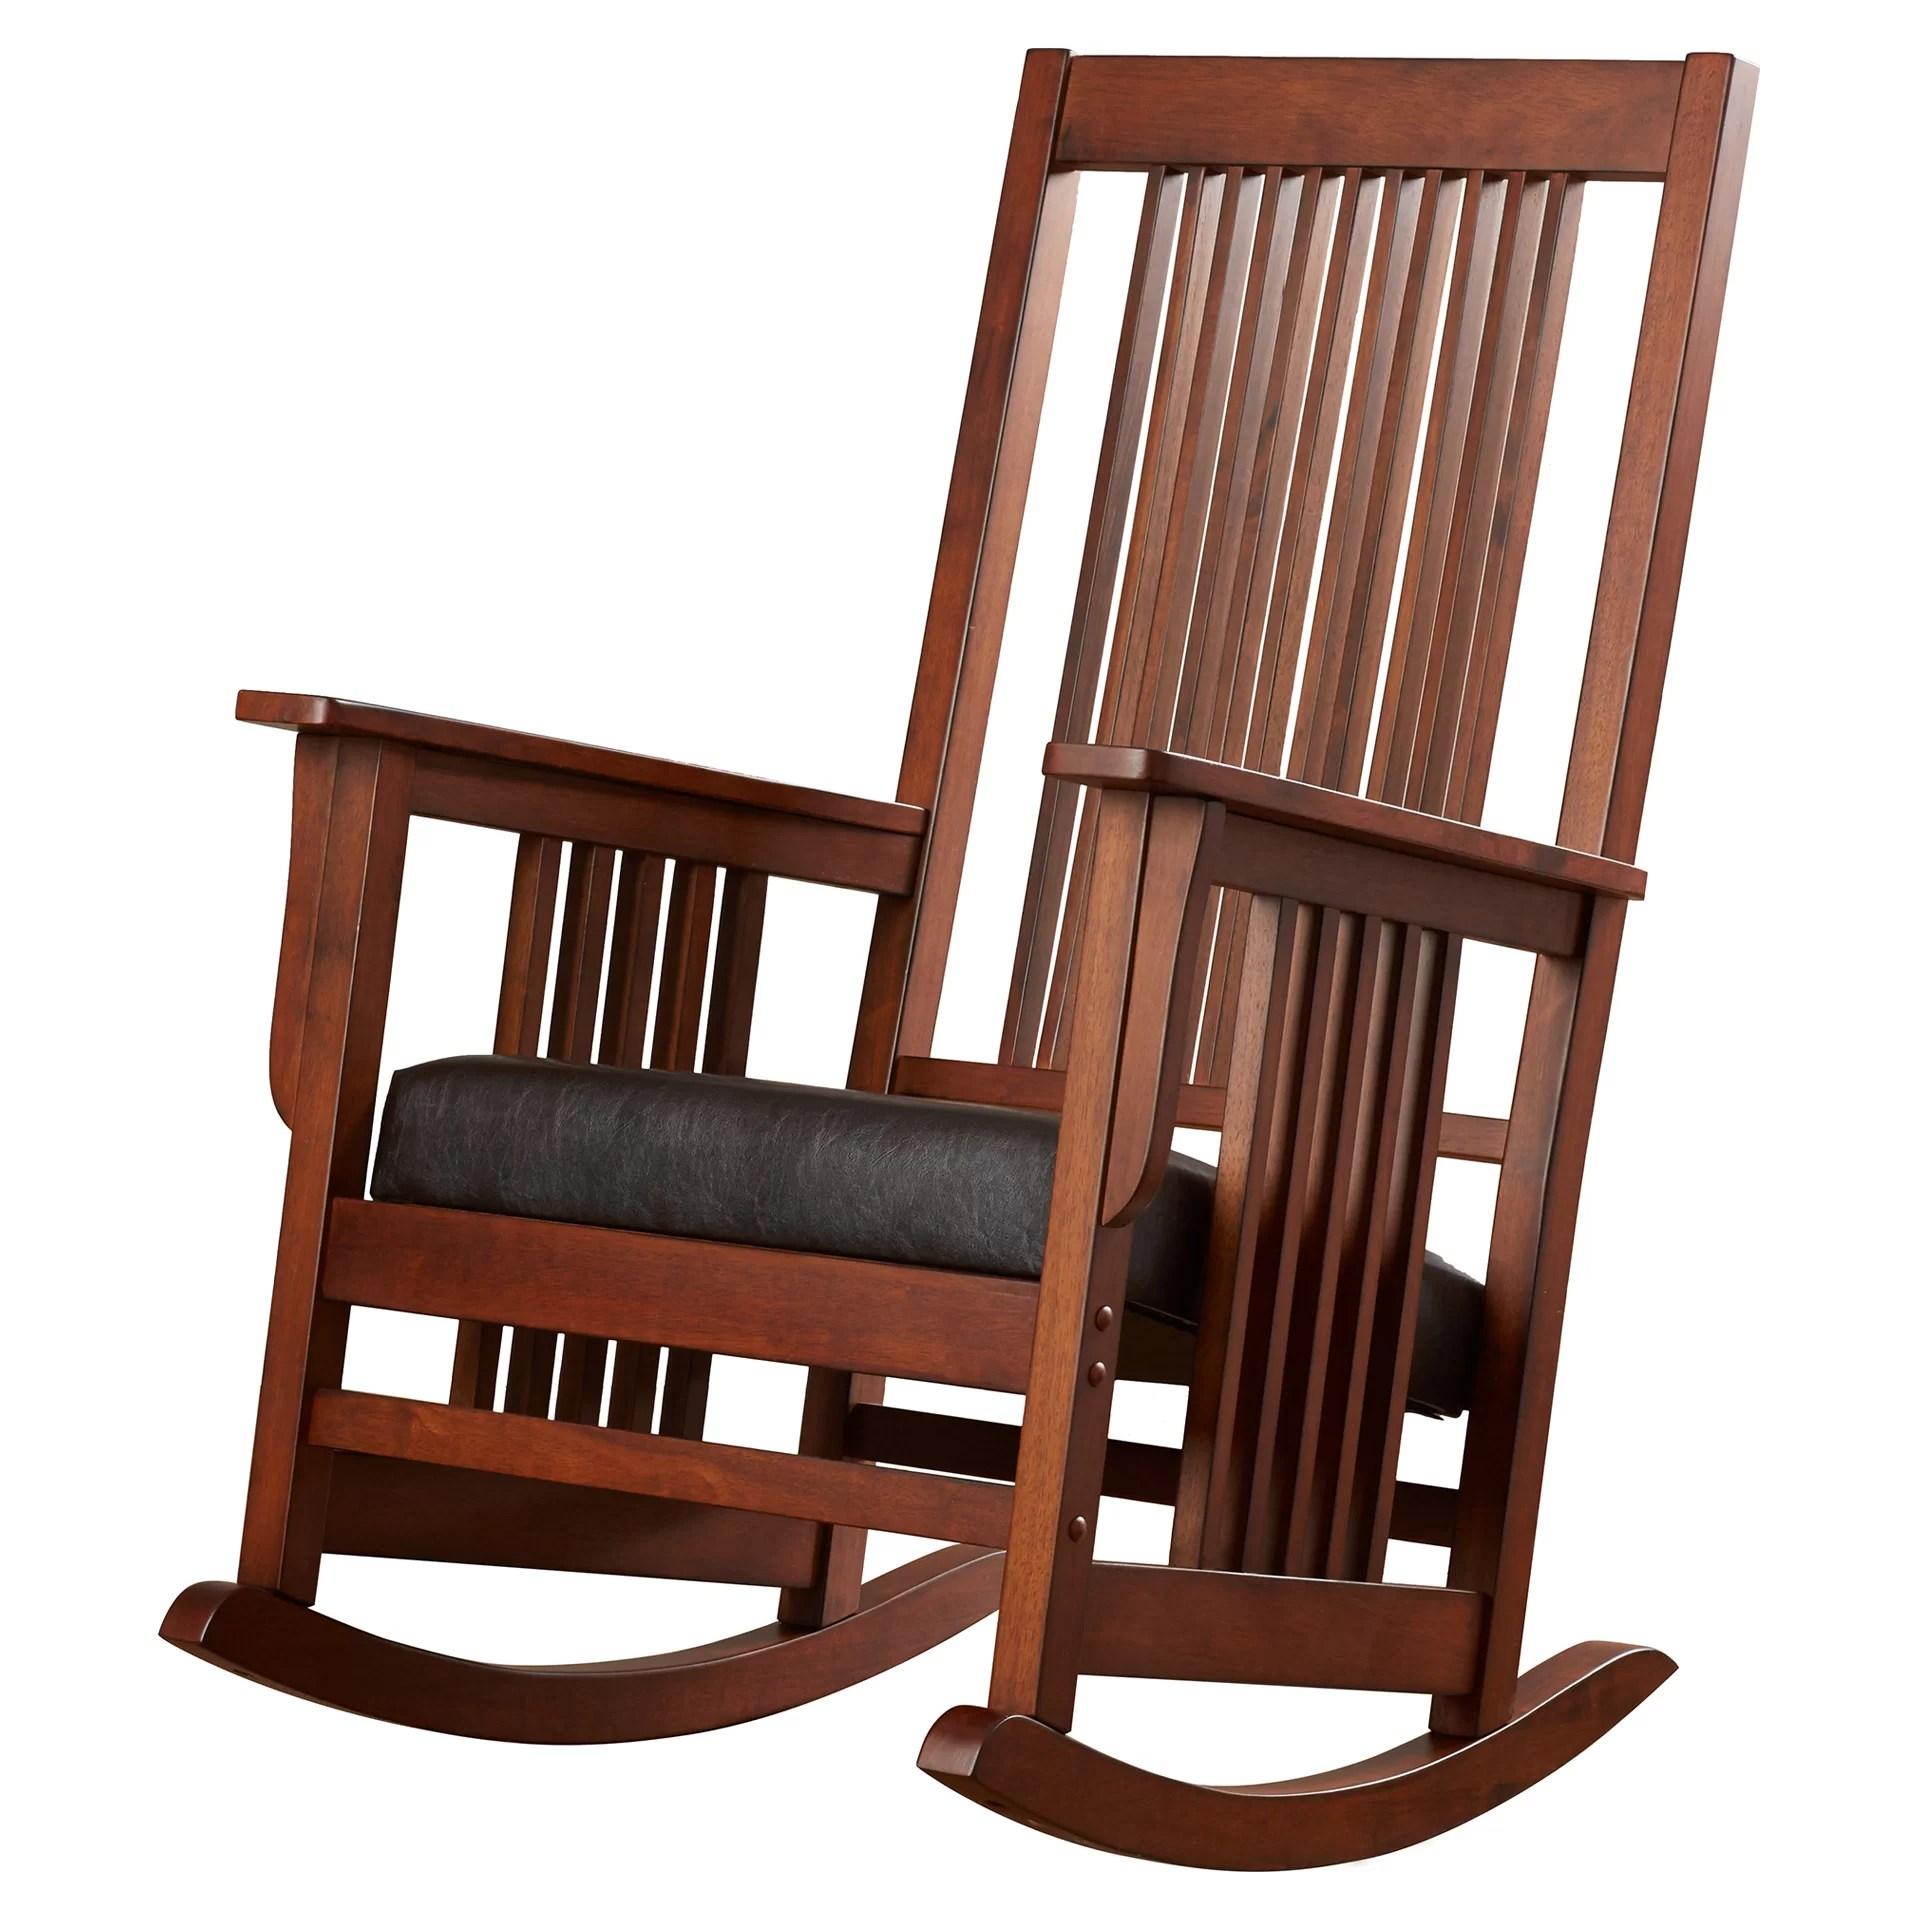 Darby Home Co Matilda Rocking Chair  Reviews  Wayfair